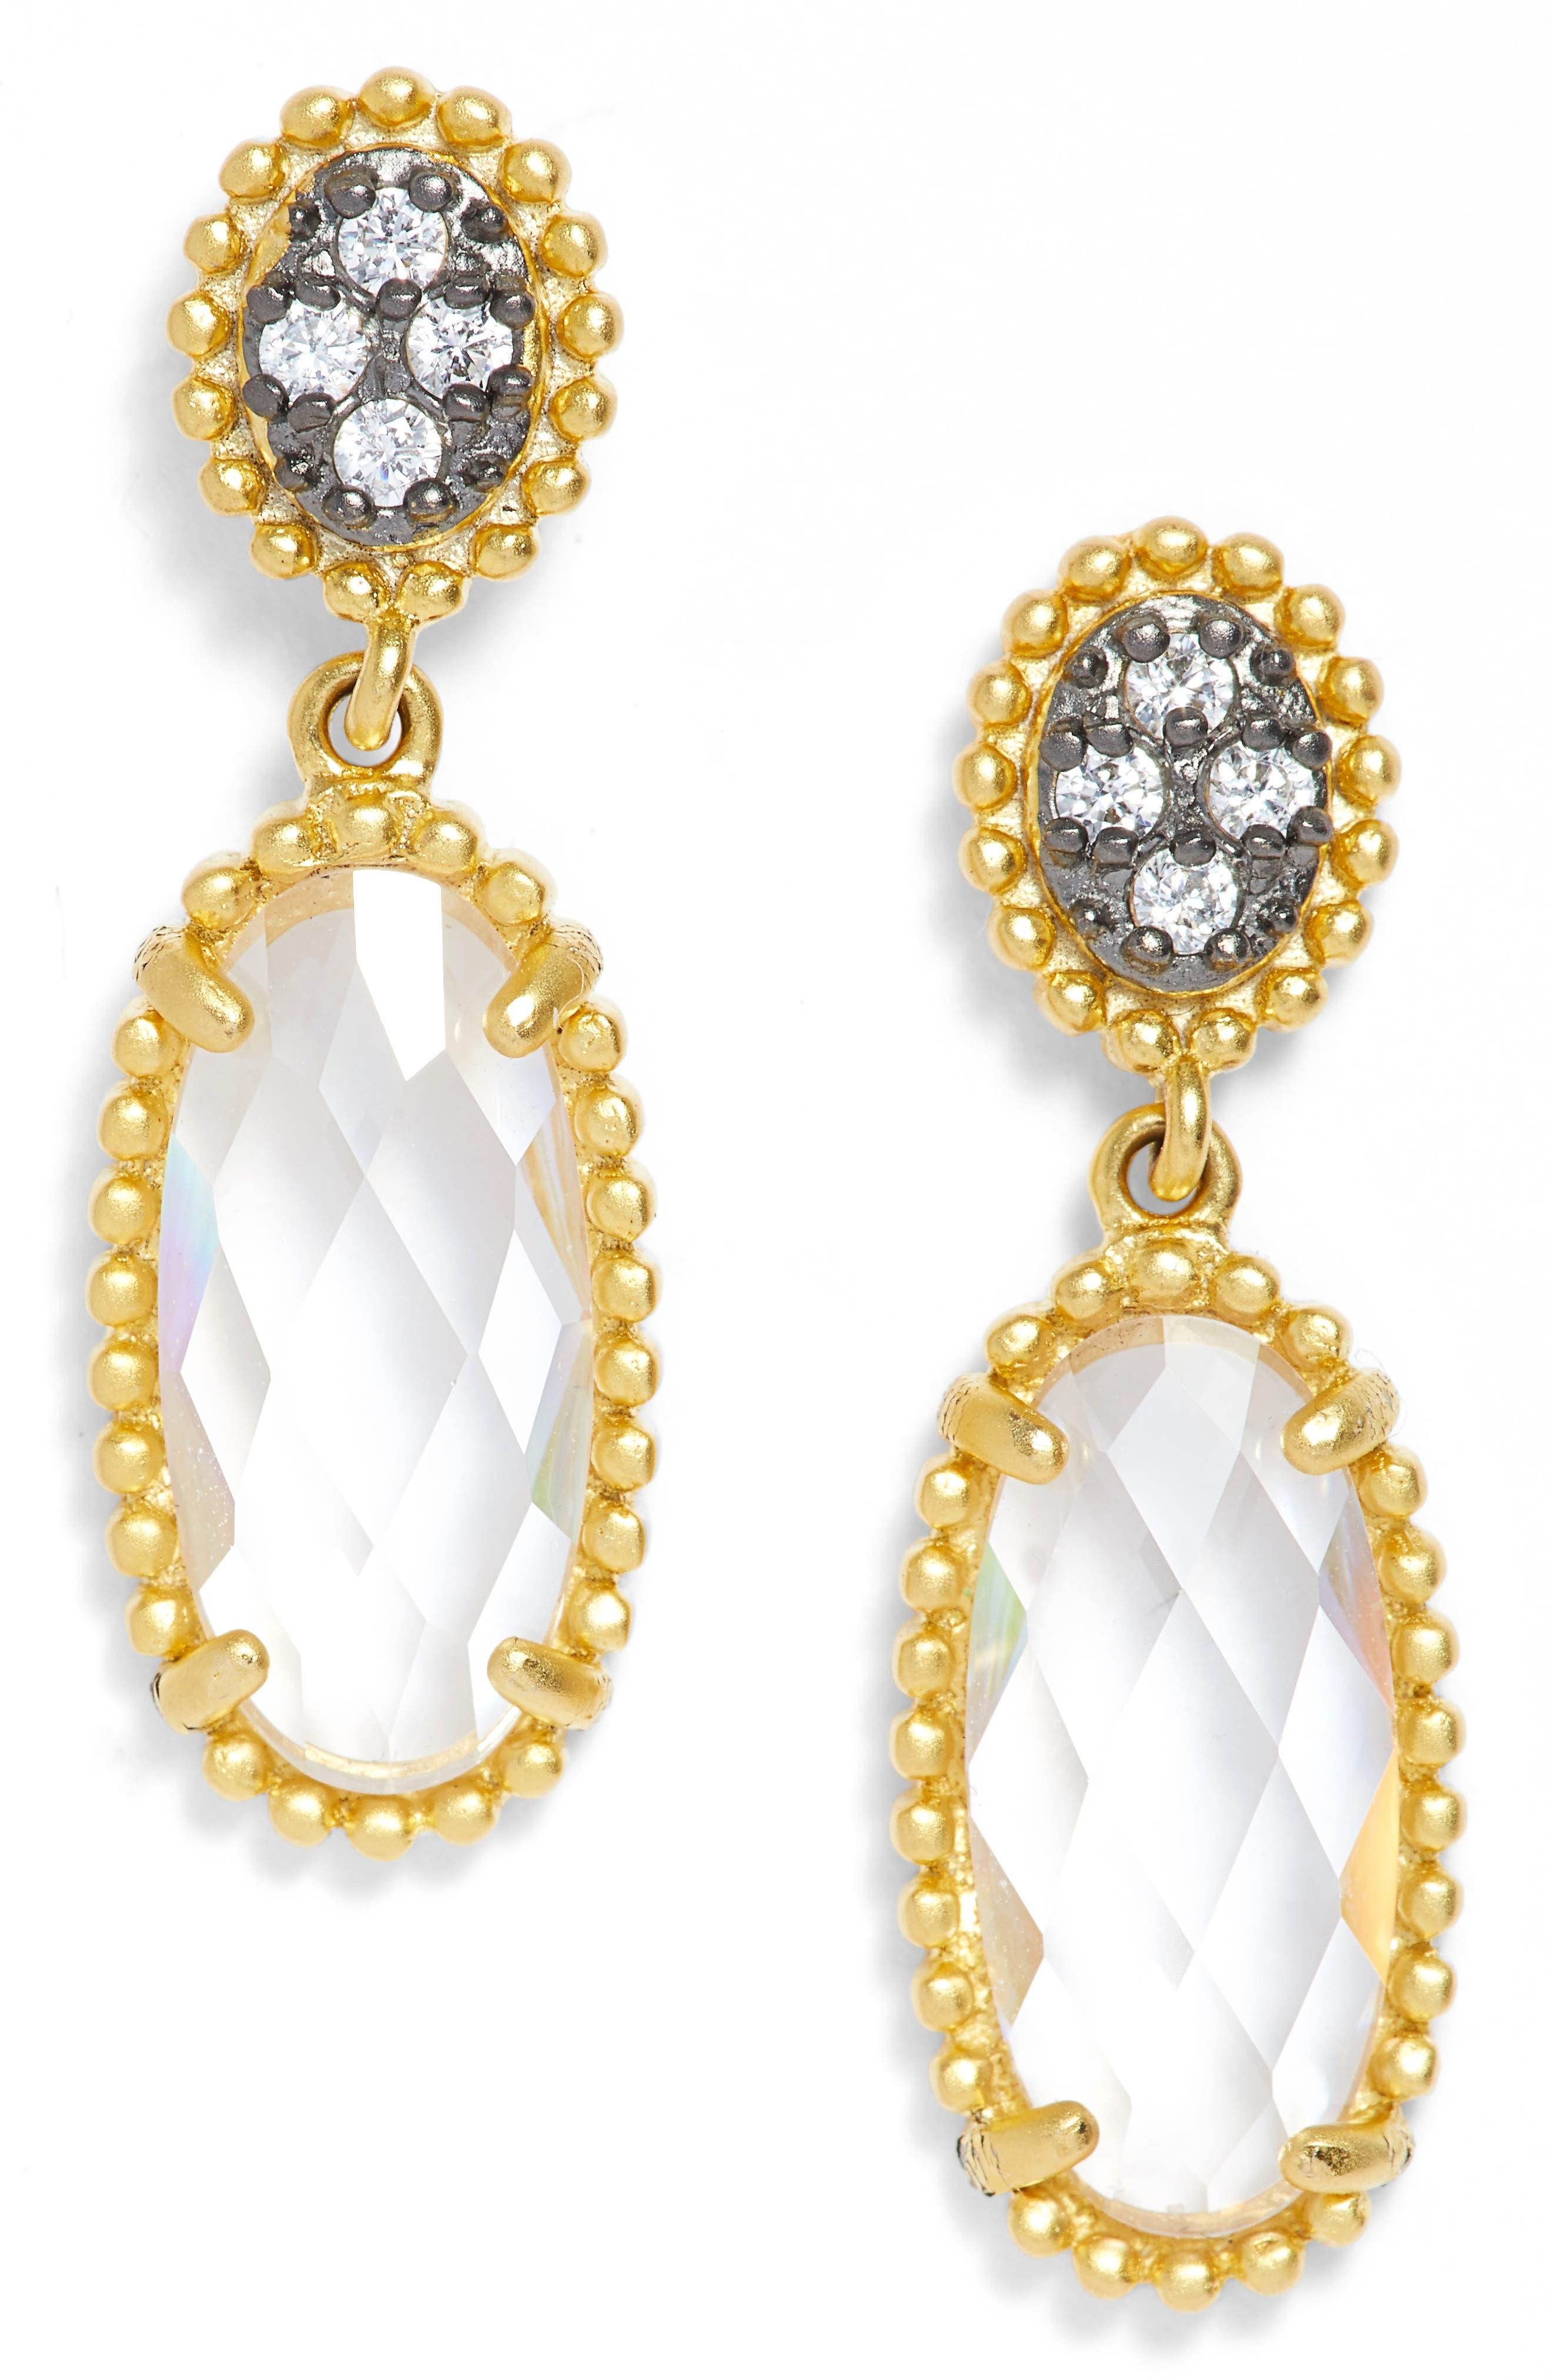 Main Image - FRIEDA ROTHMAN Oval Drop Earrings